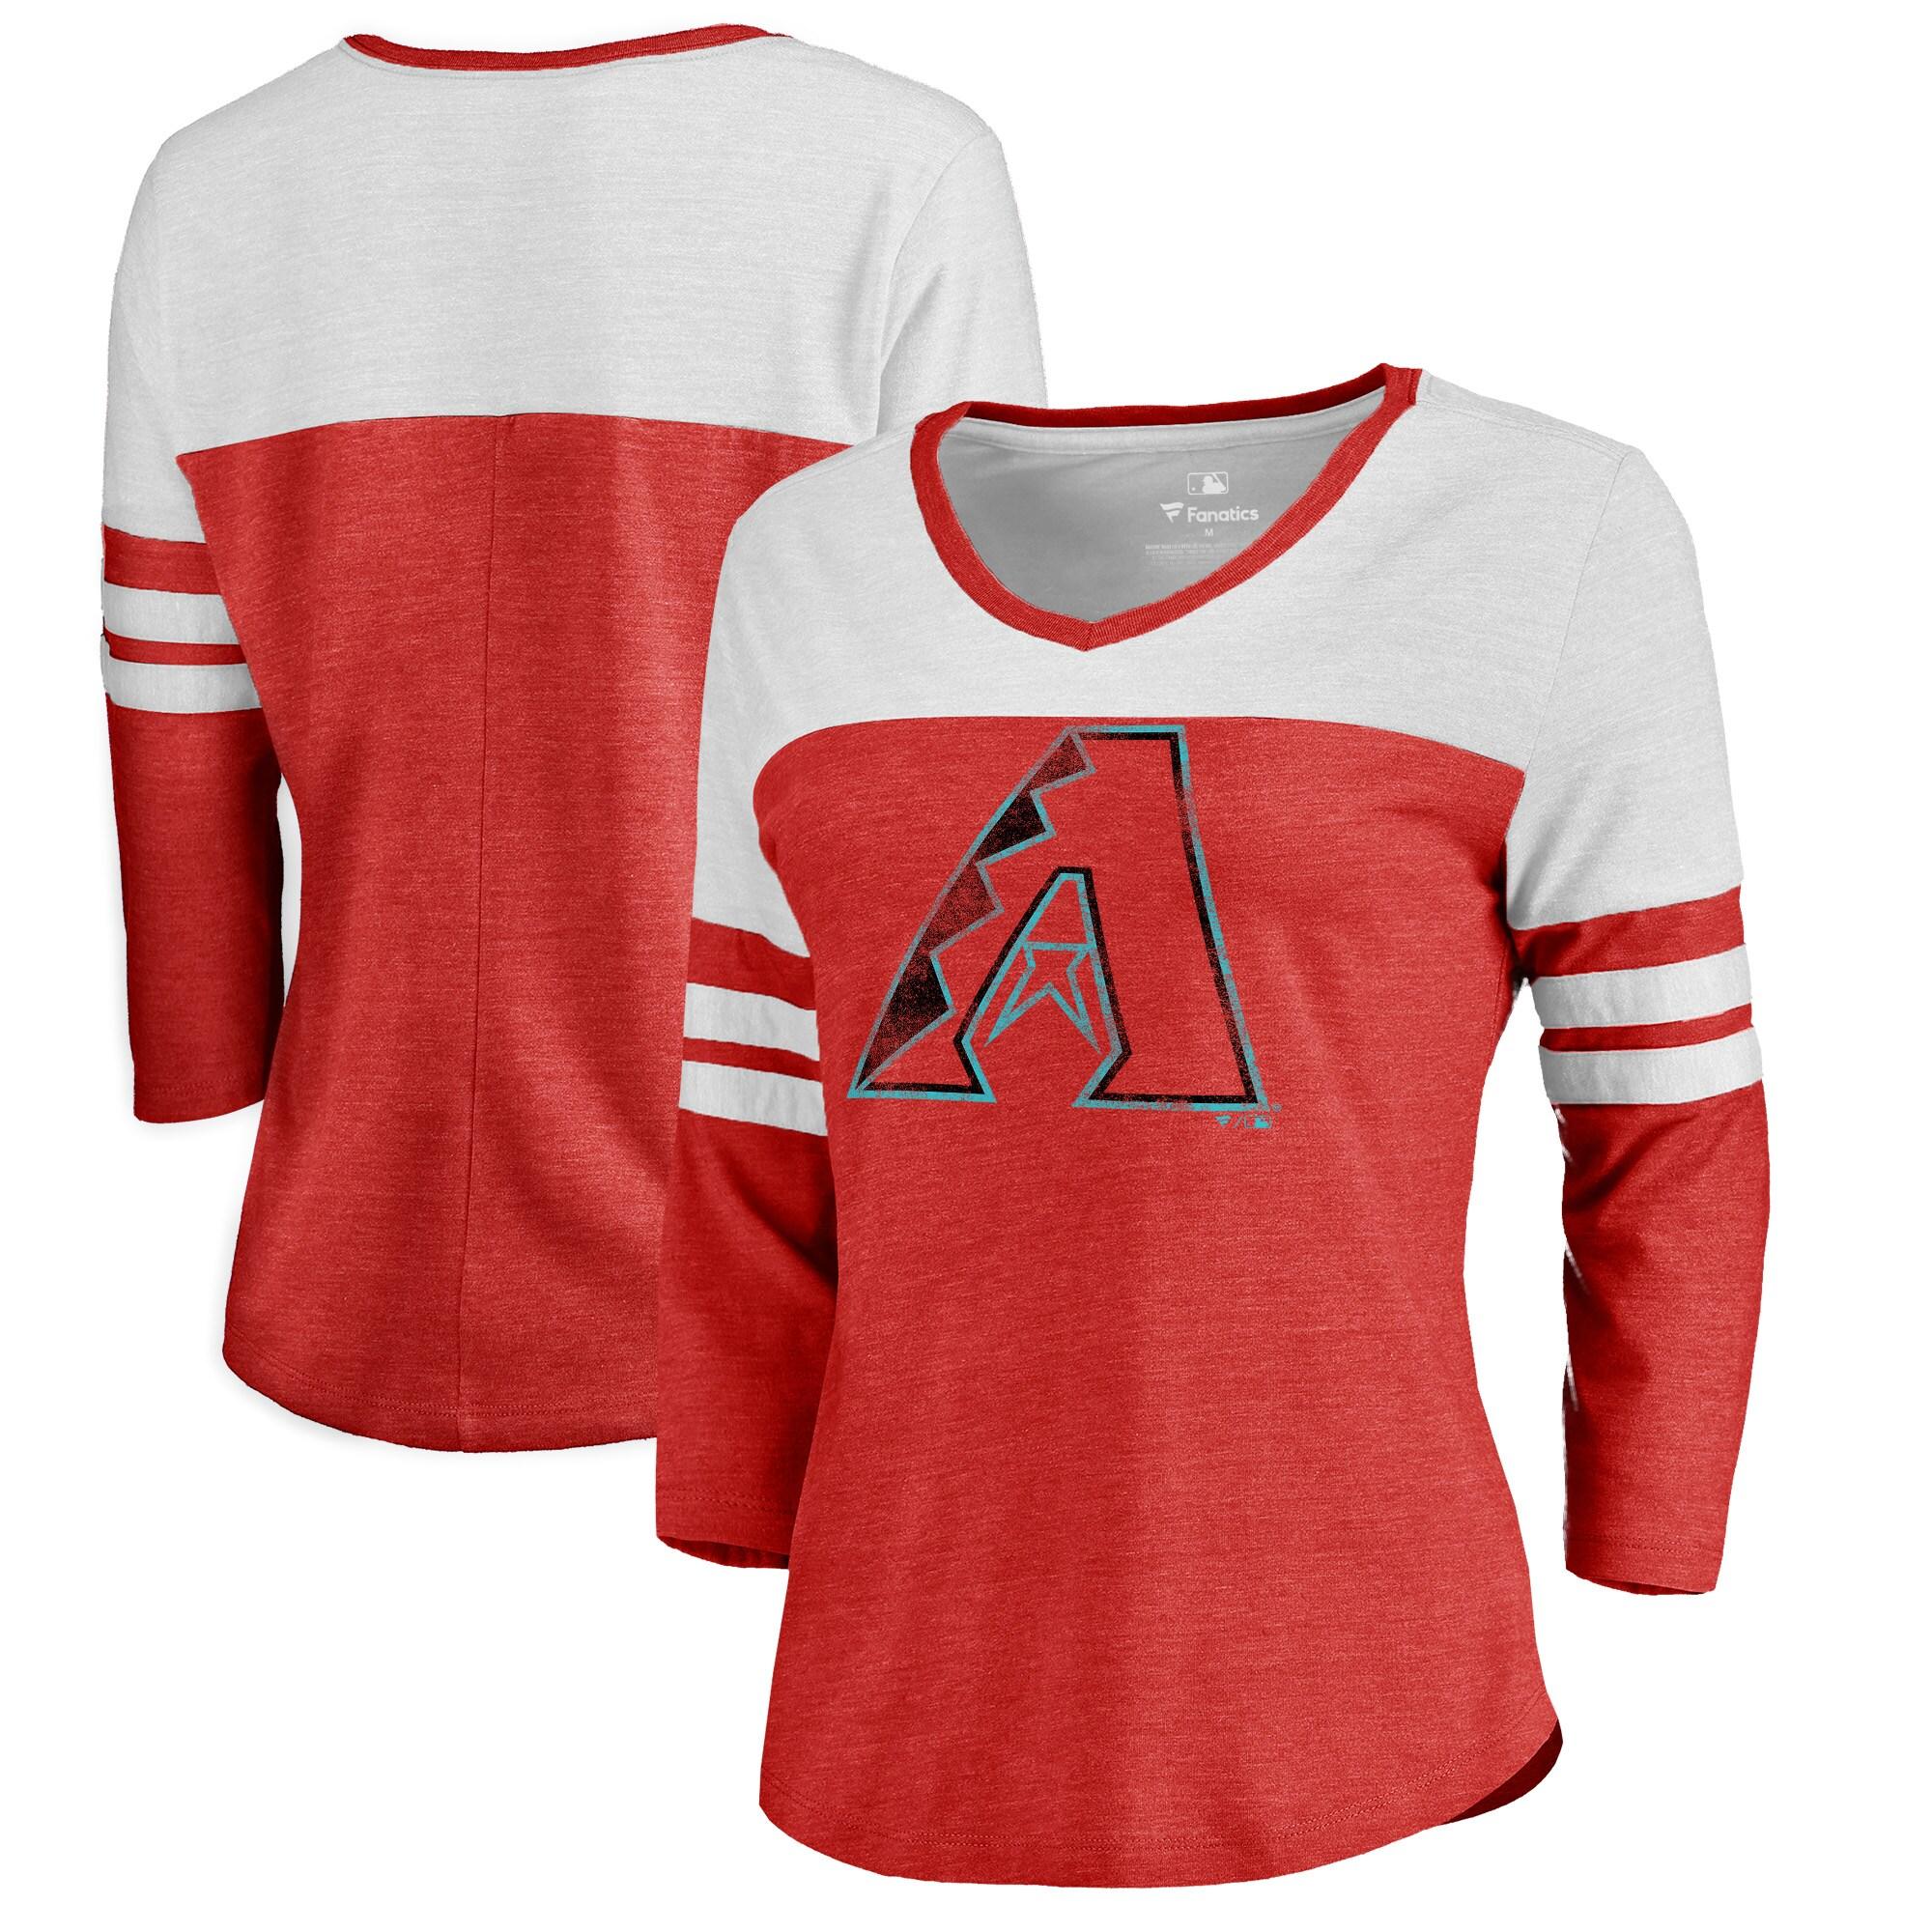 Arizona Diamondbacks Fanatics Branded Women's Distressed Team Logo 3/4 Sleeve Tri-Blend T-Shirt - Red/White